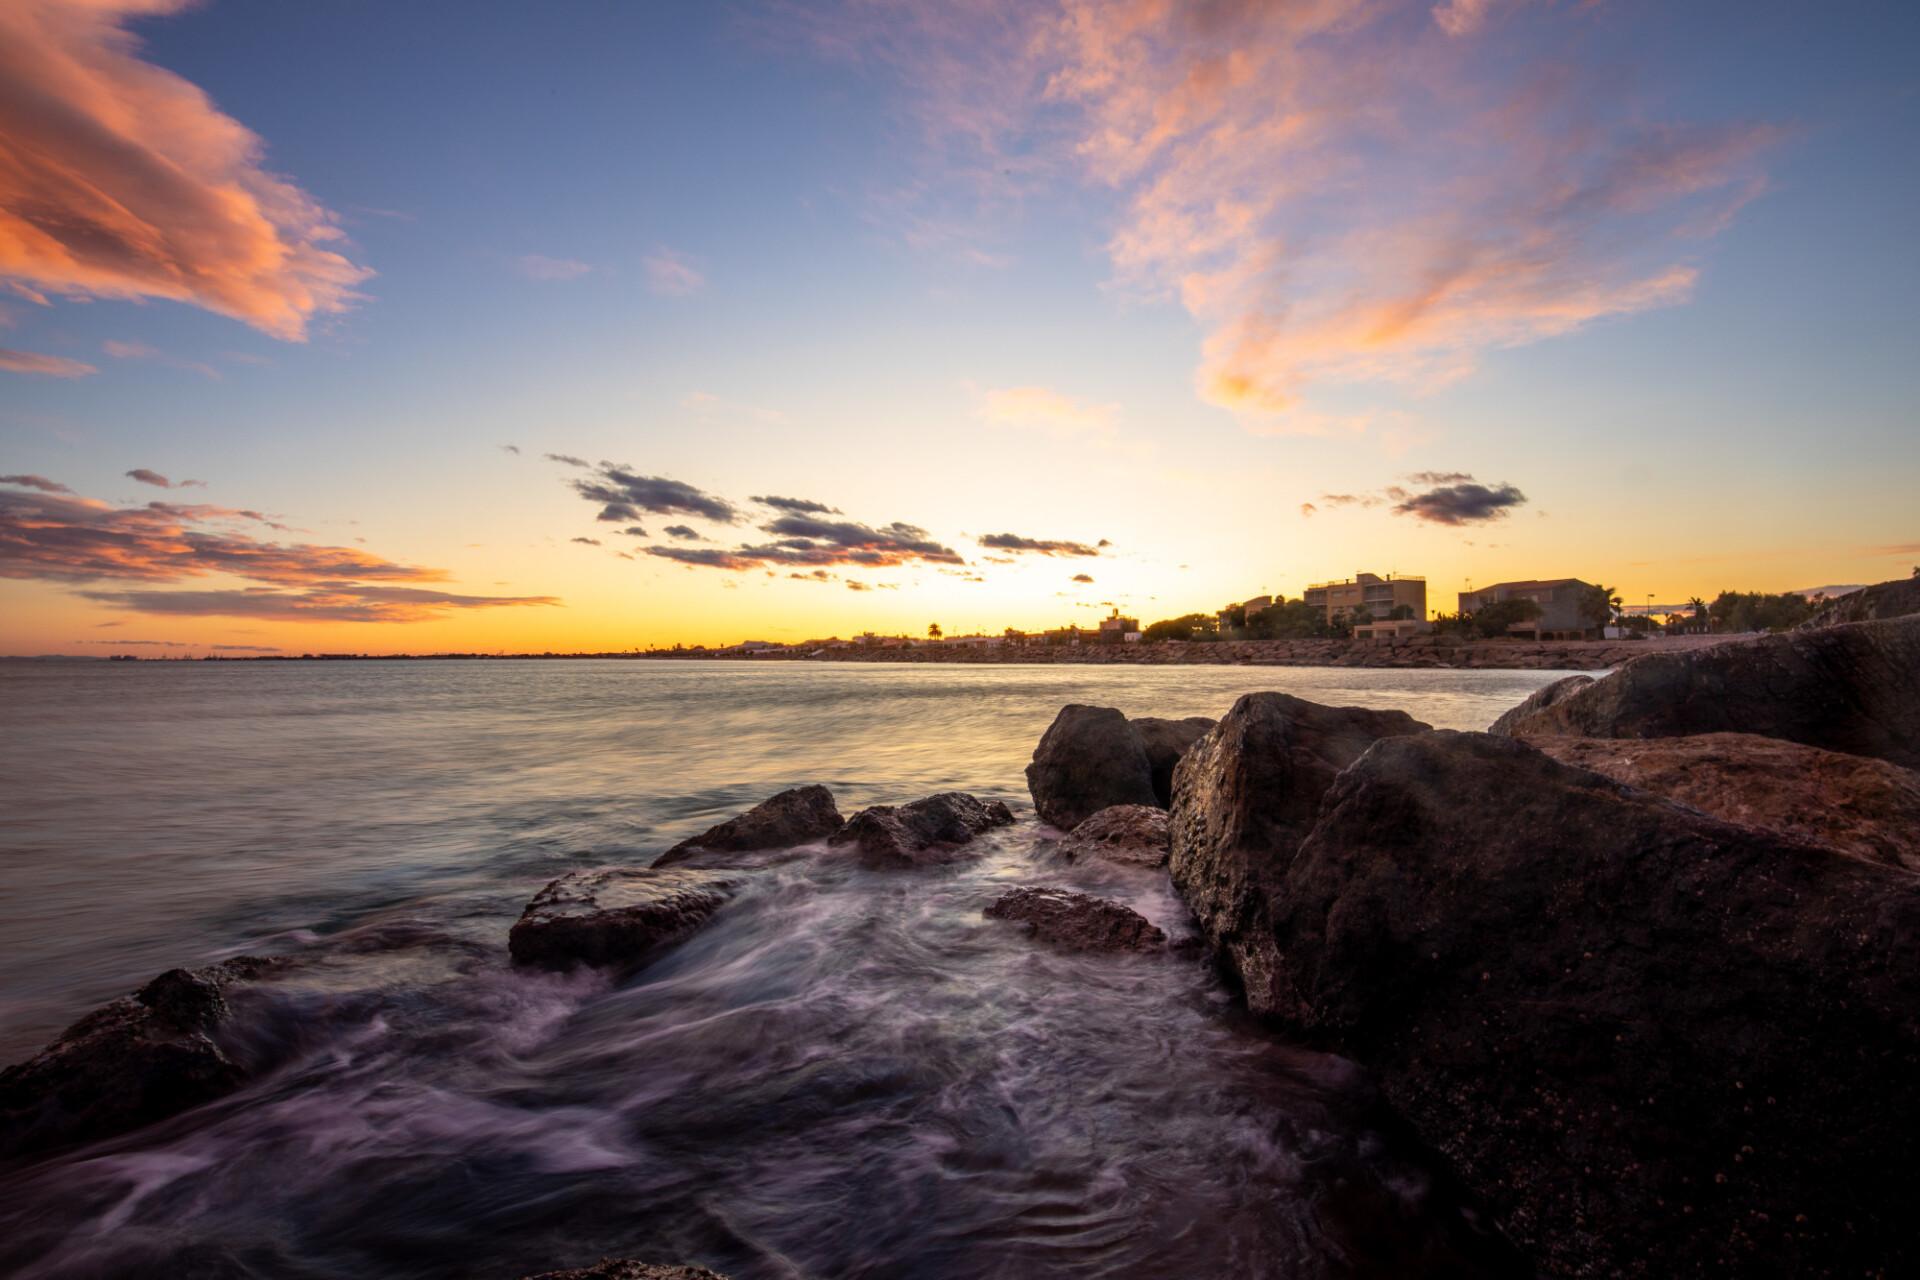 Sunset over Casablanca in Spain seascape